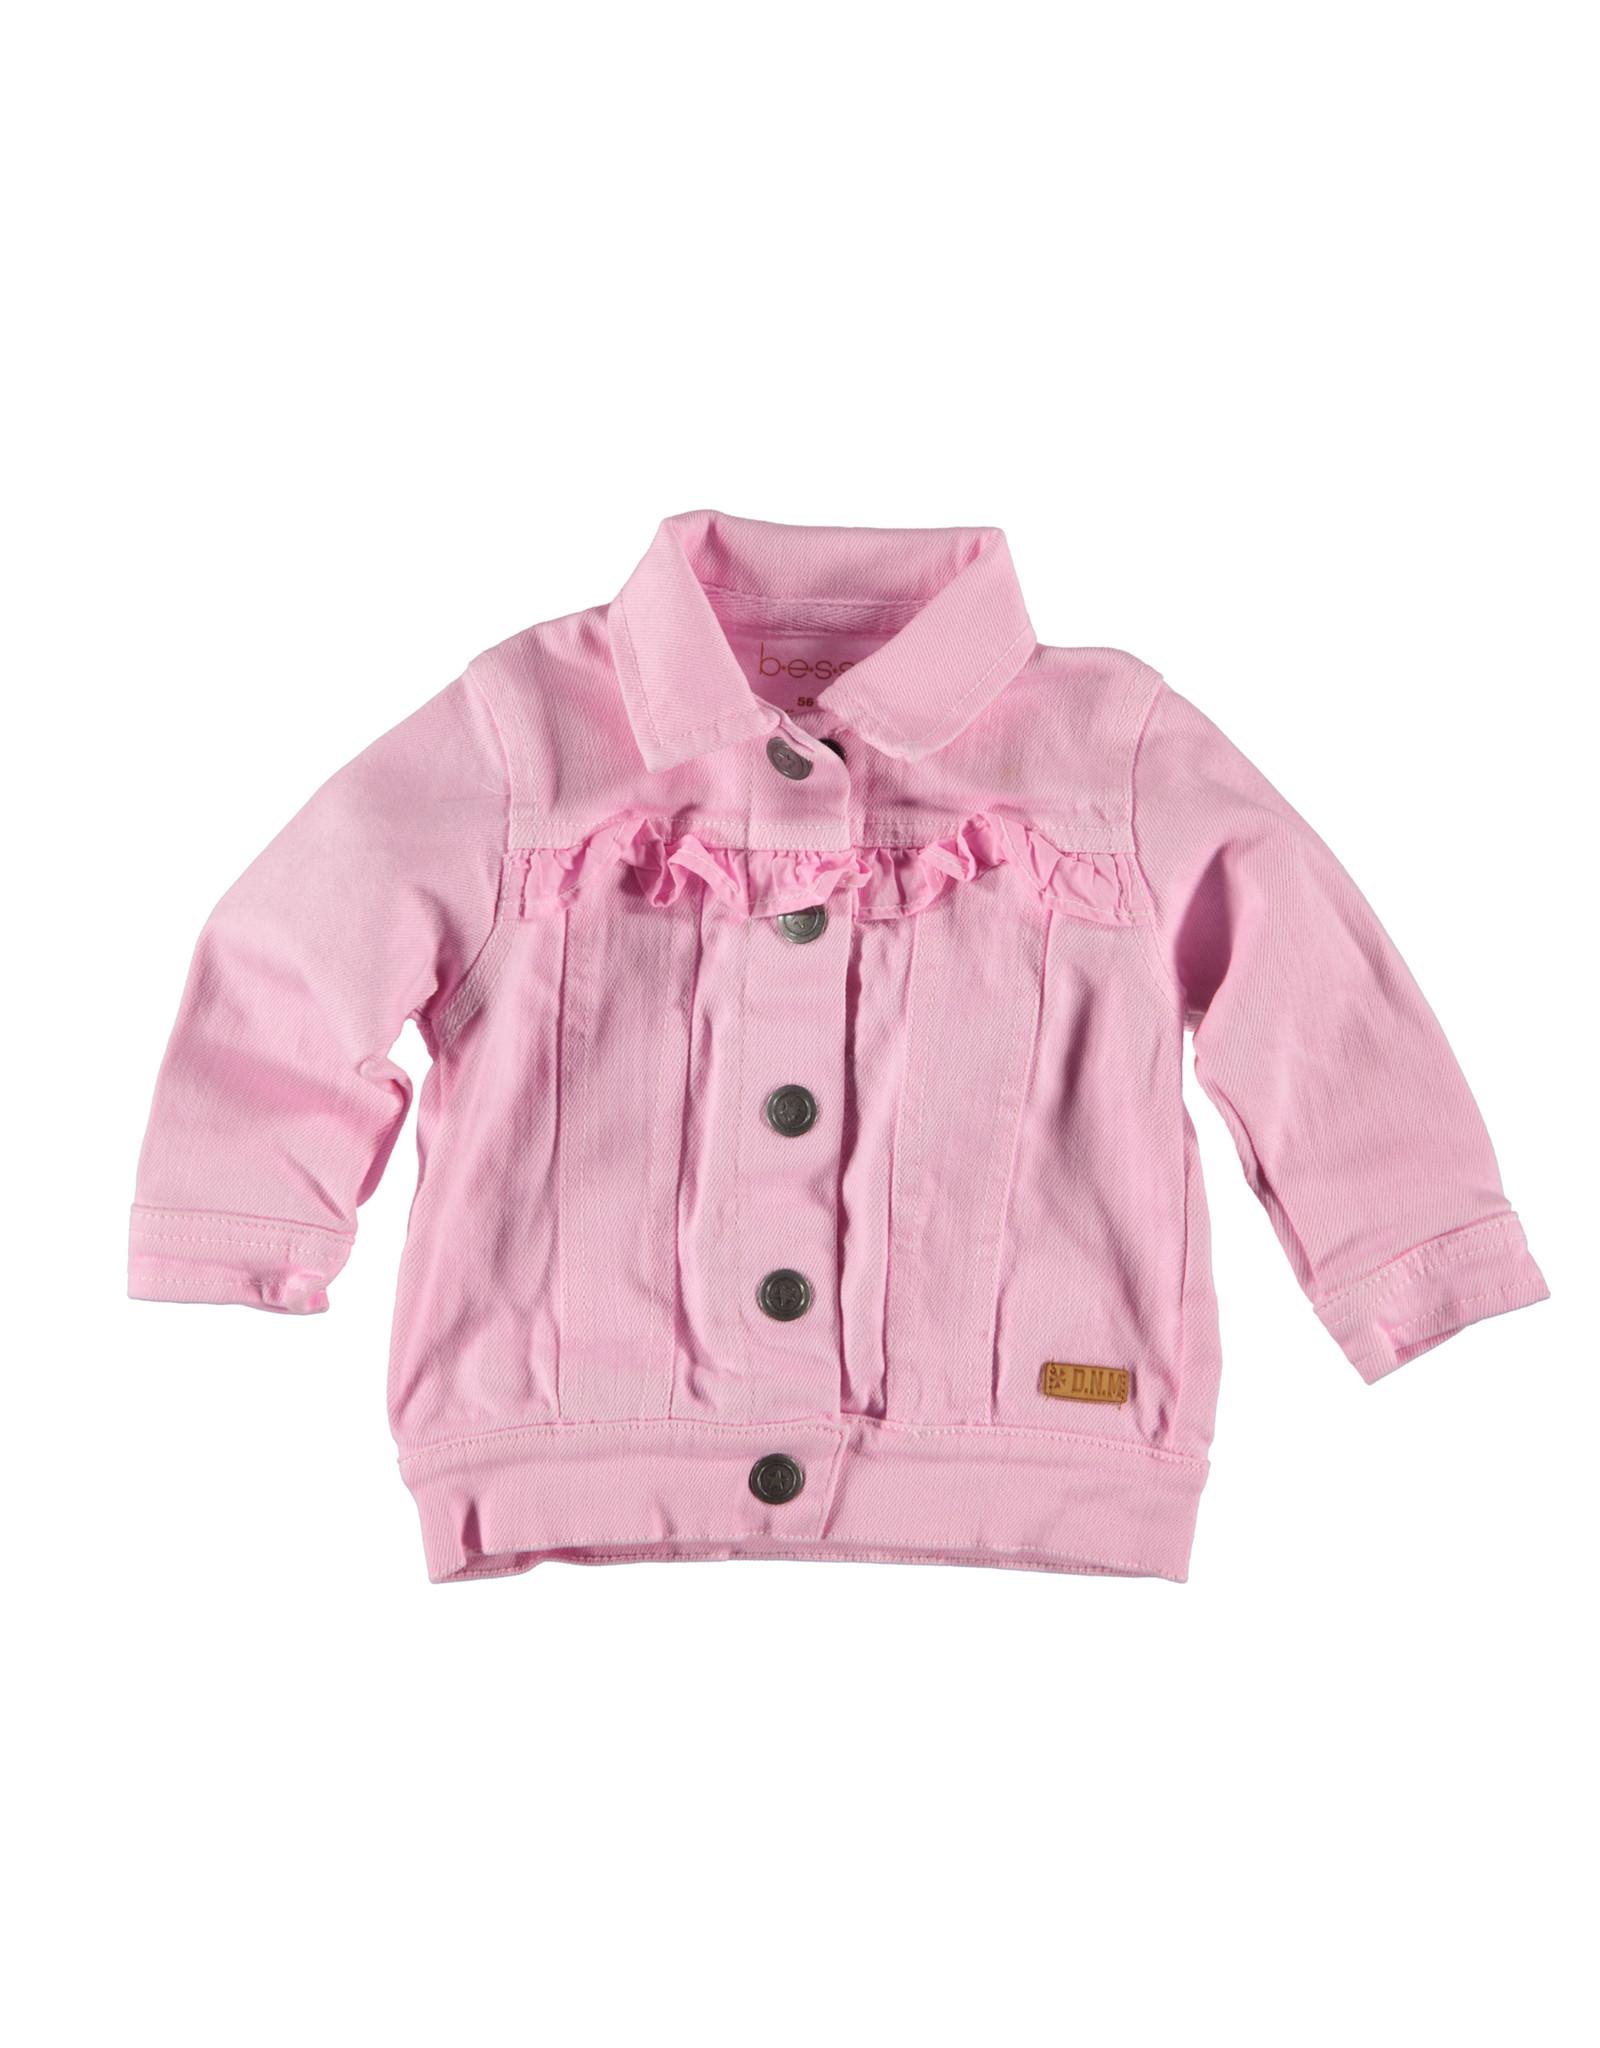 Bess Jeans Jacket Ruffles Pink